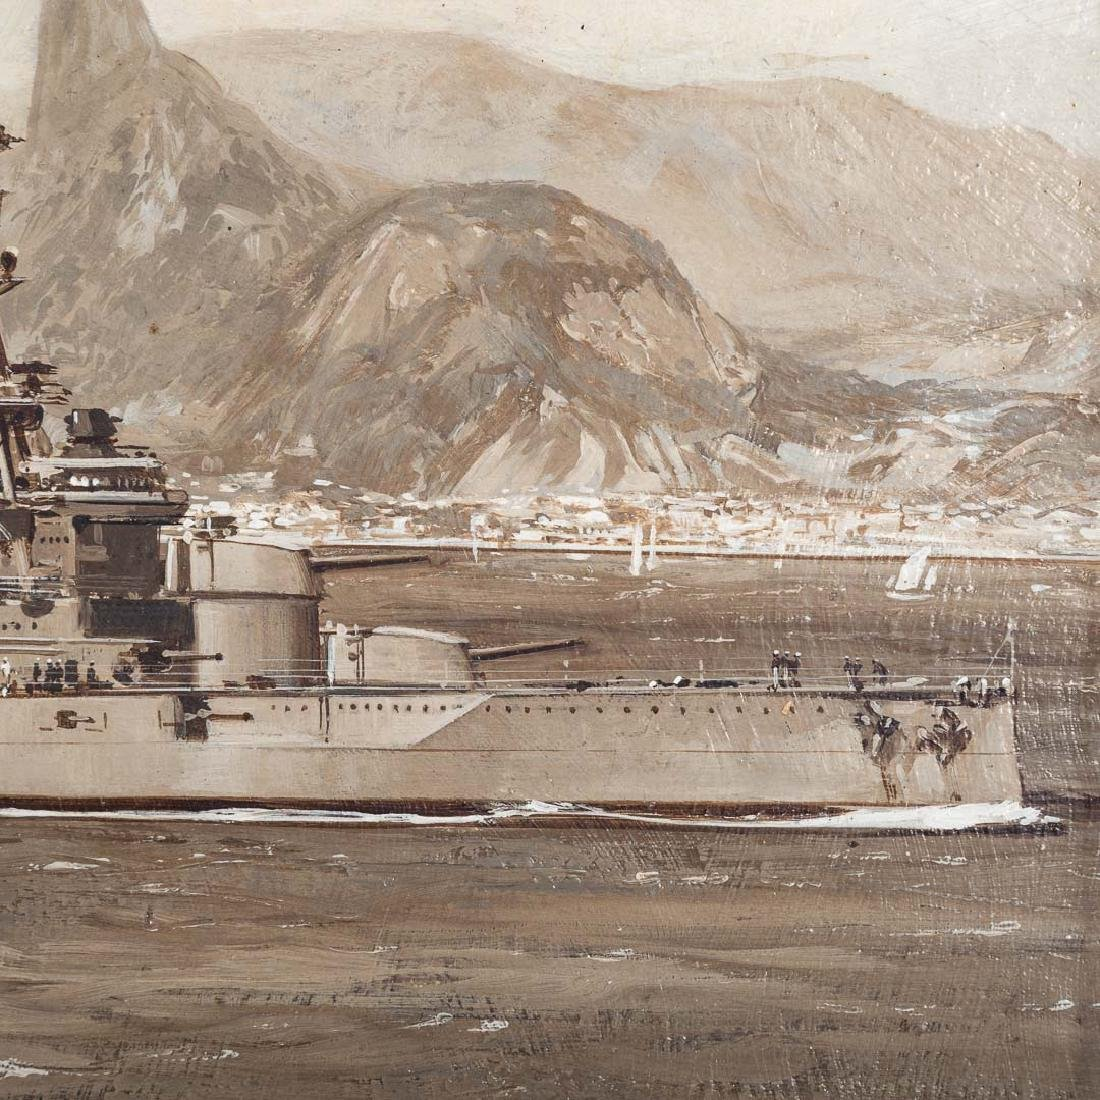 Montague Dawson. British Destroyer-Rio de Janeiro - 3